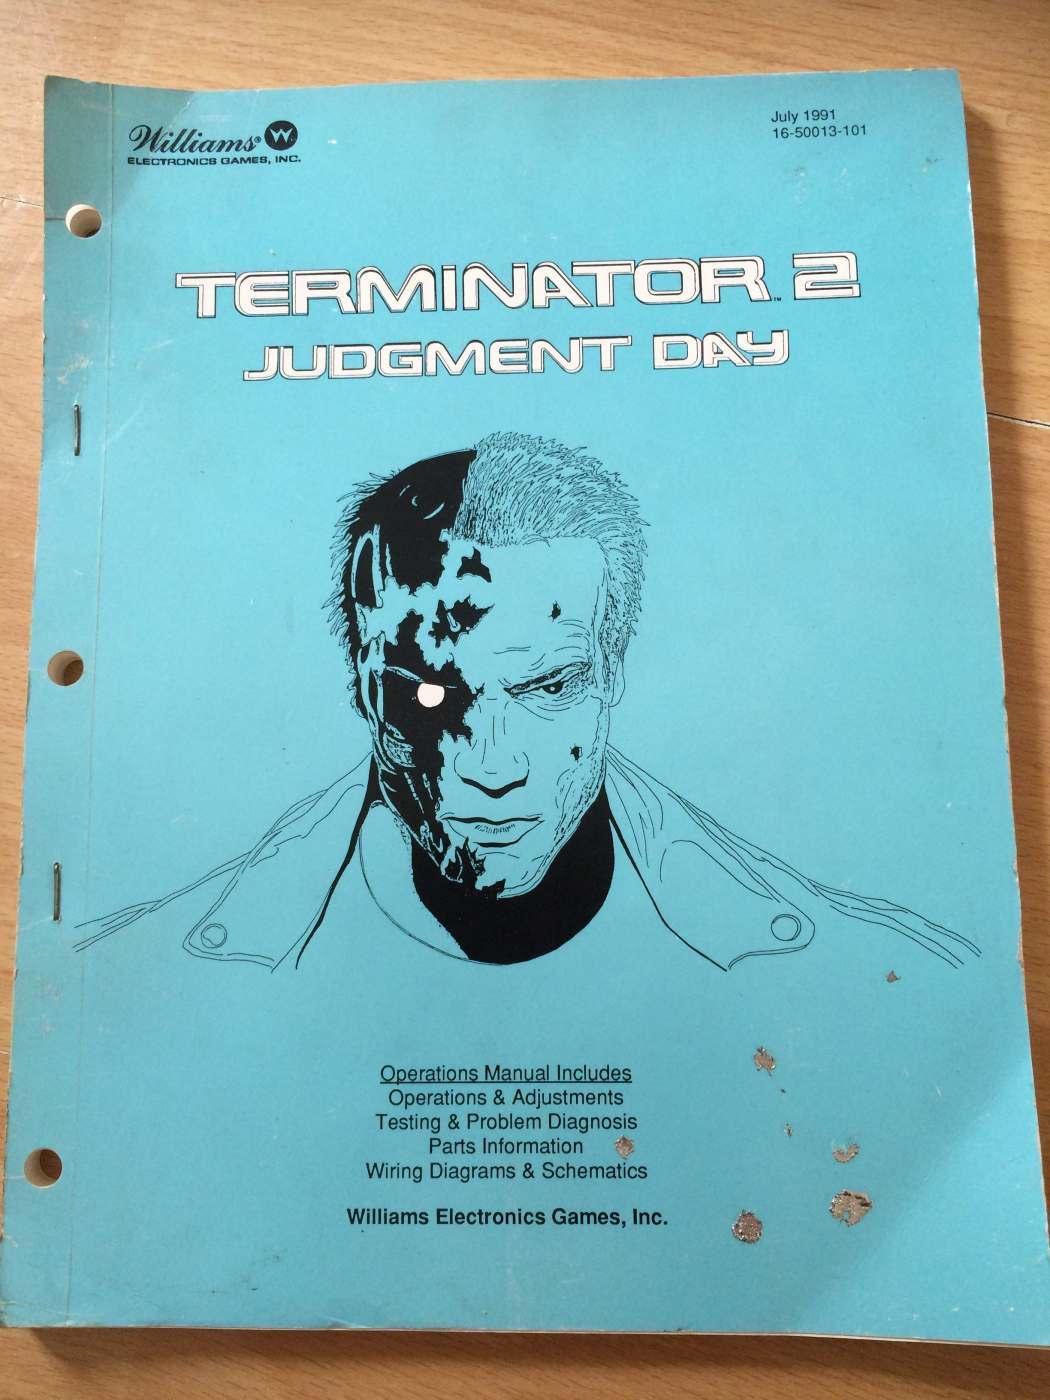 Williams Terminator 2 Judgment Day Pinball Manual London Wiring Diagrams